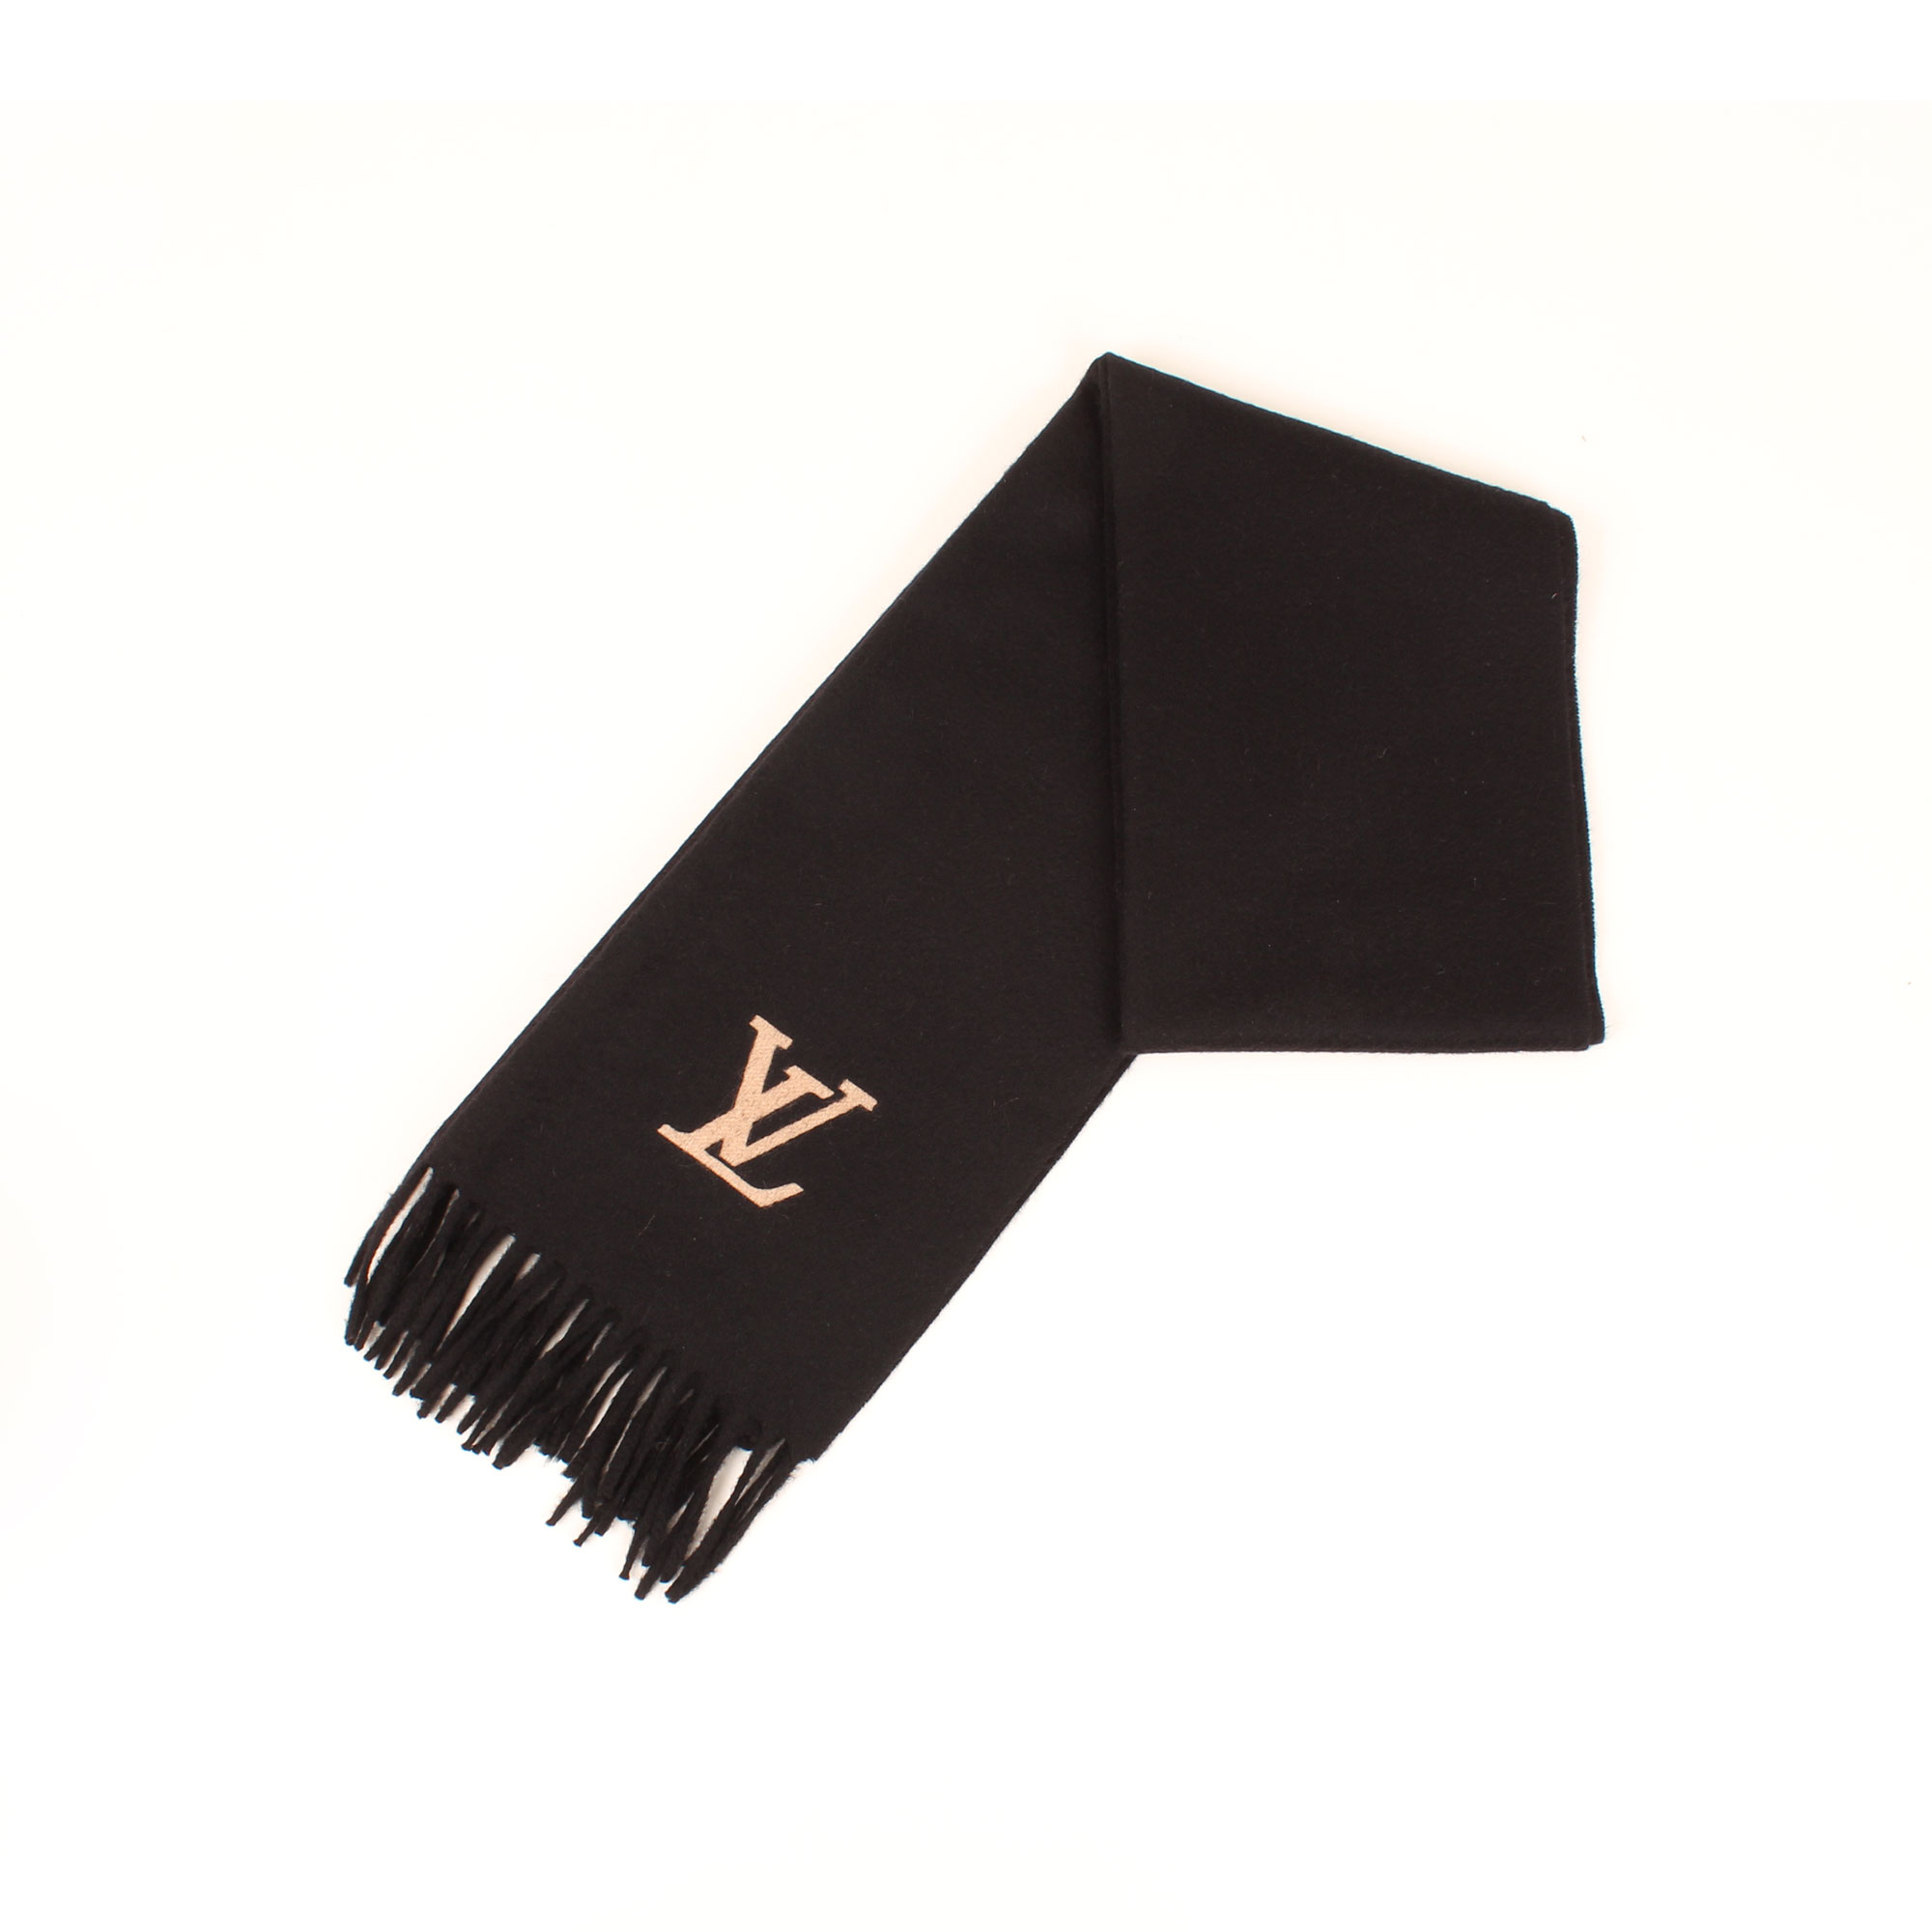 bufanda-louis-vuitton-jehlam-cashmere-negra-doblada